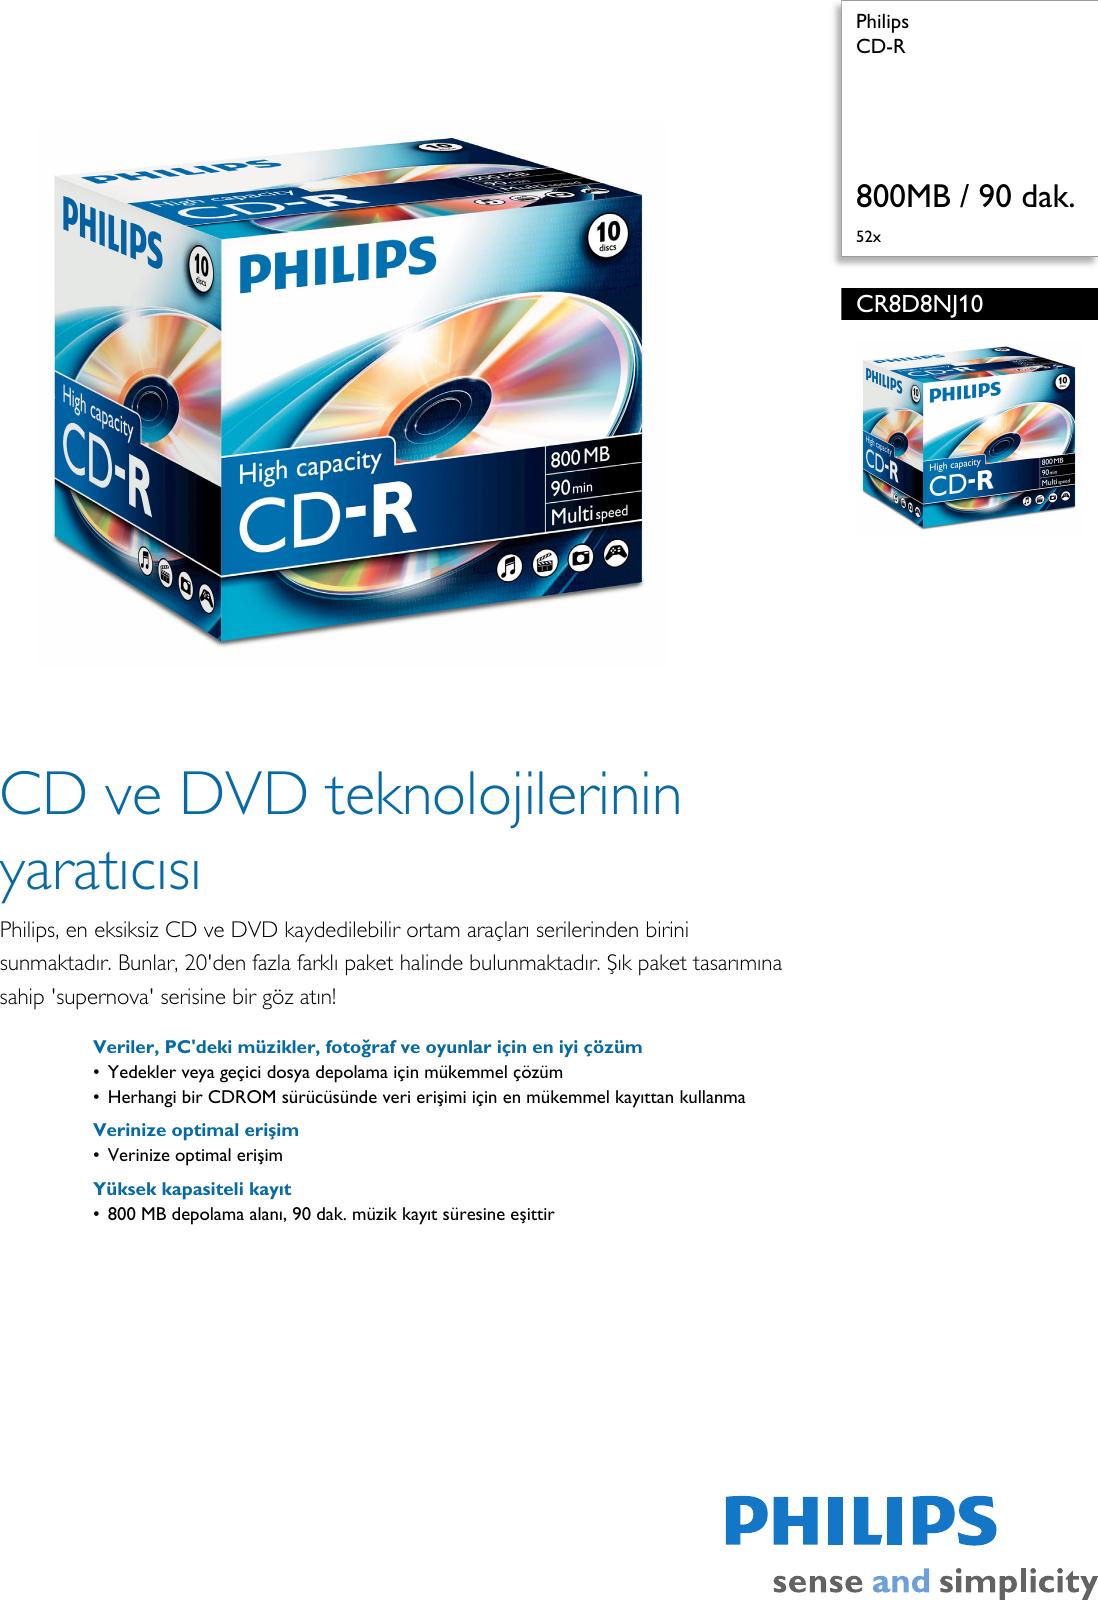 Philips CR8D8NJ10 00 CD R User Manual Bror Cr8d8nj10 Pss Turtr